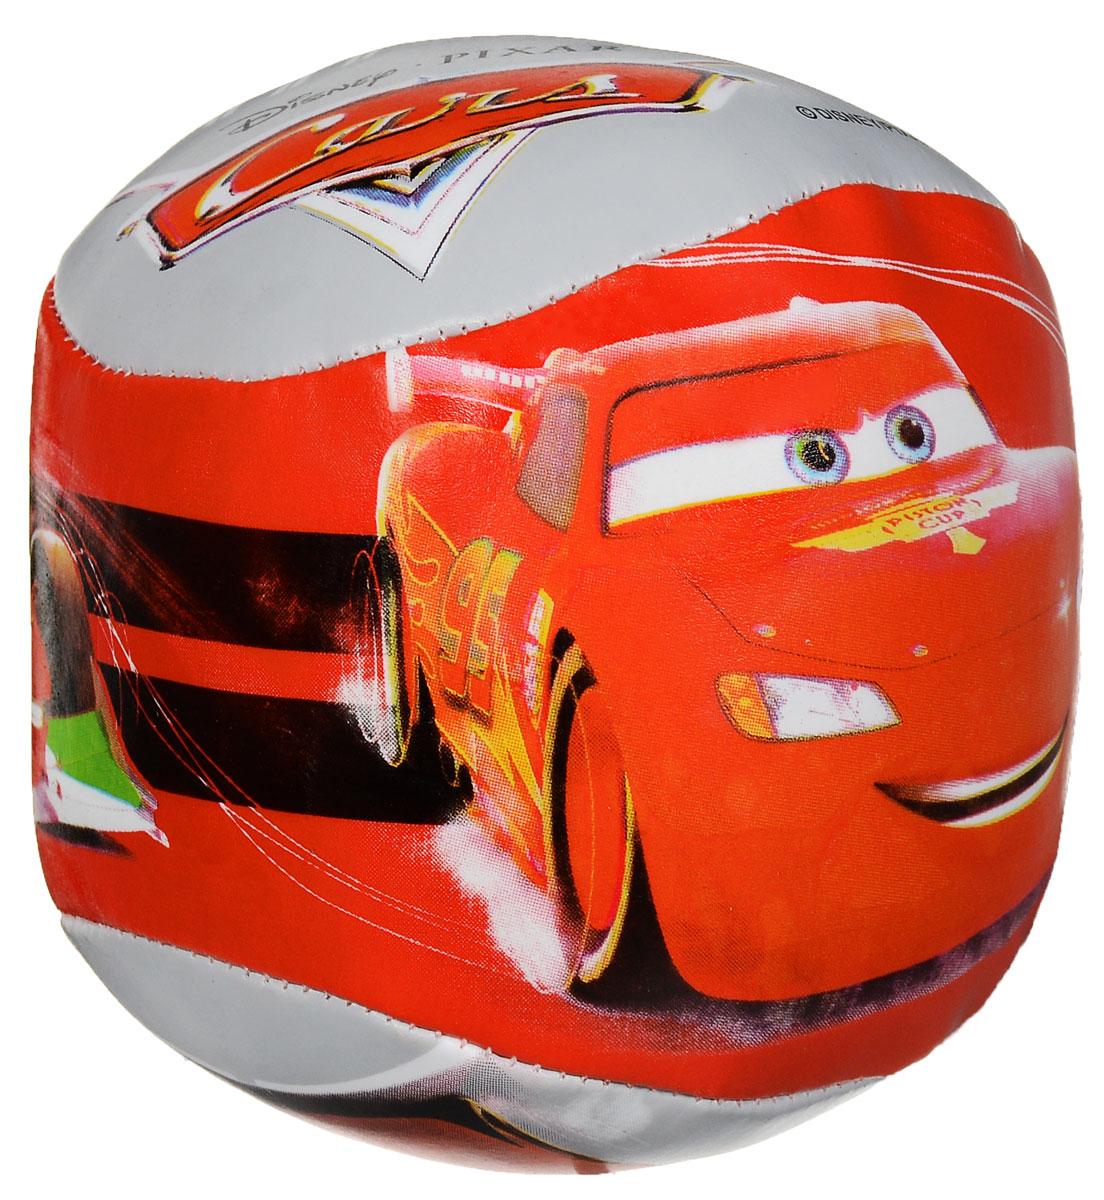 John Мяч Cars Lightning McQueen мягкий мяч развивающий